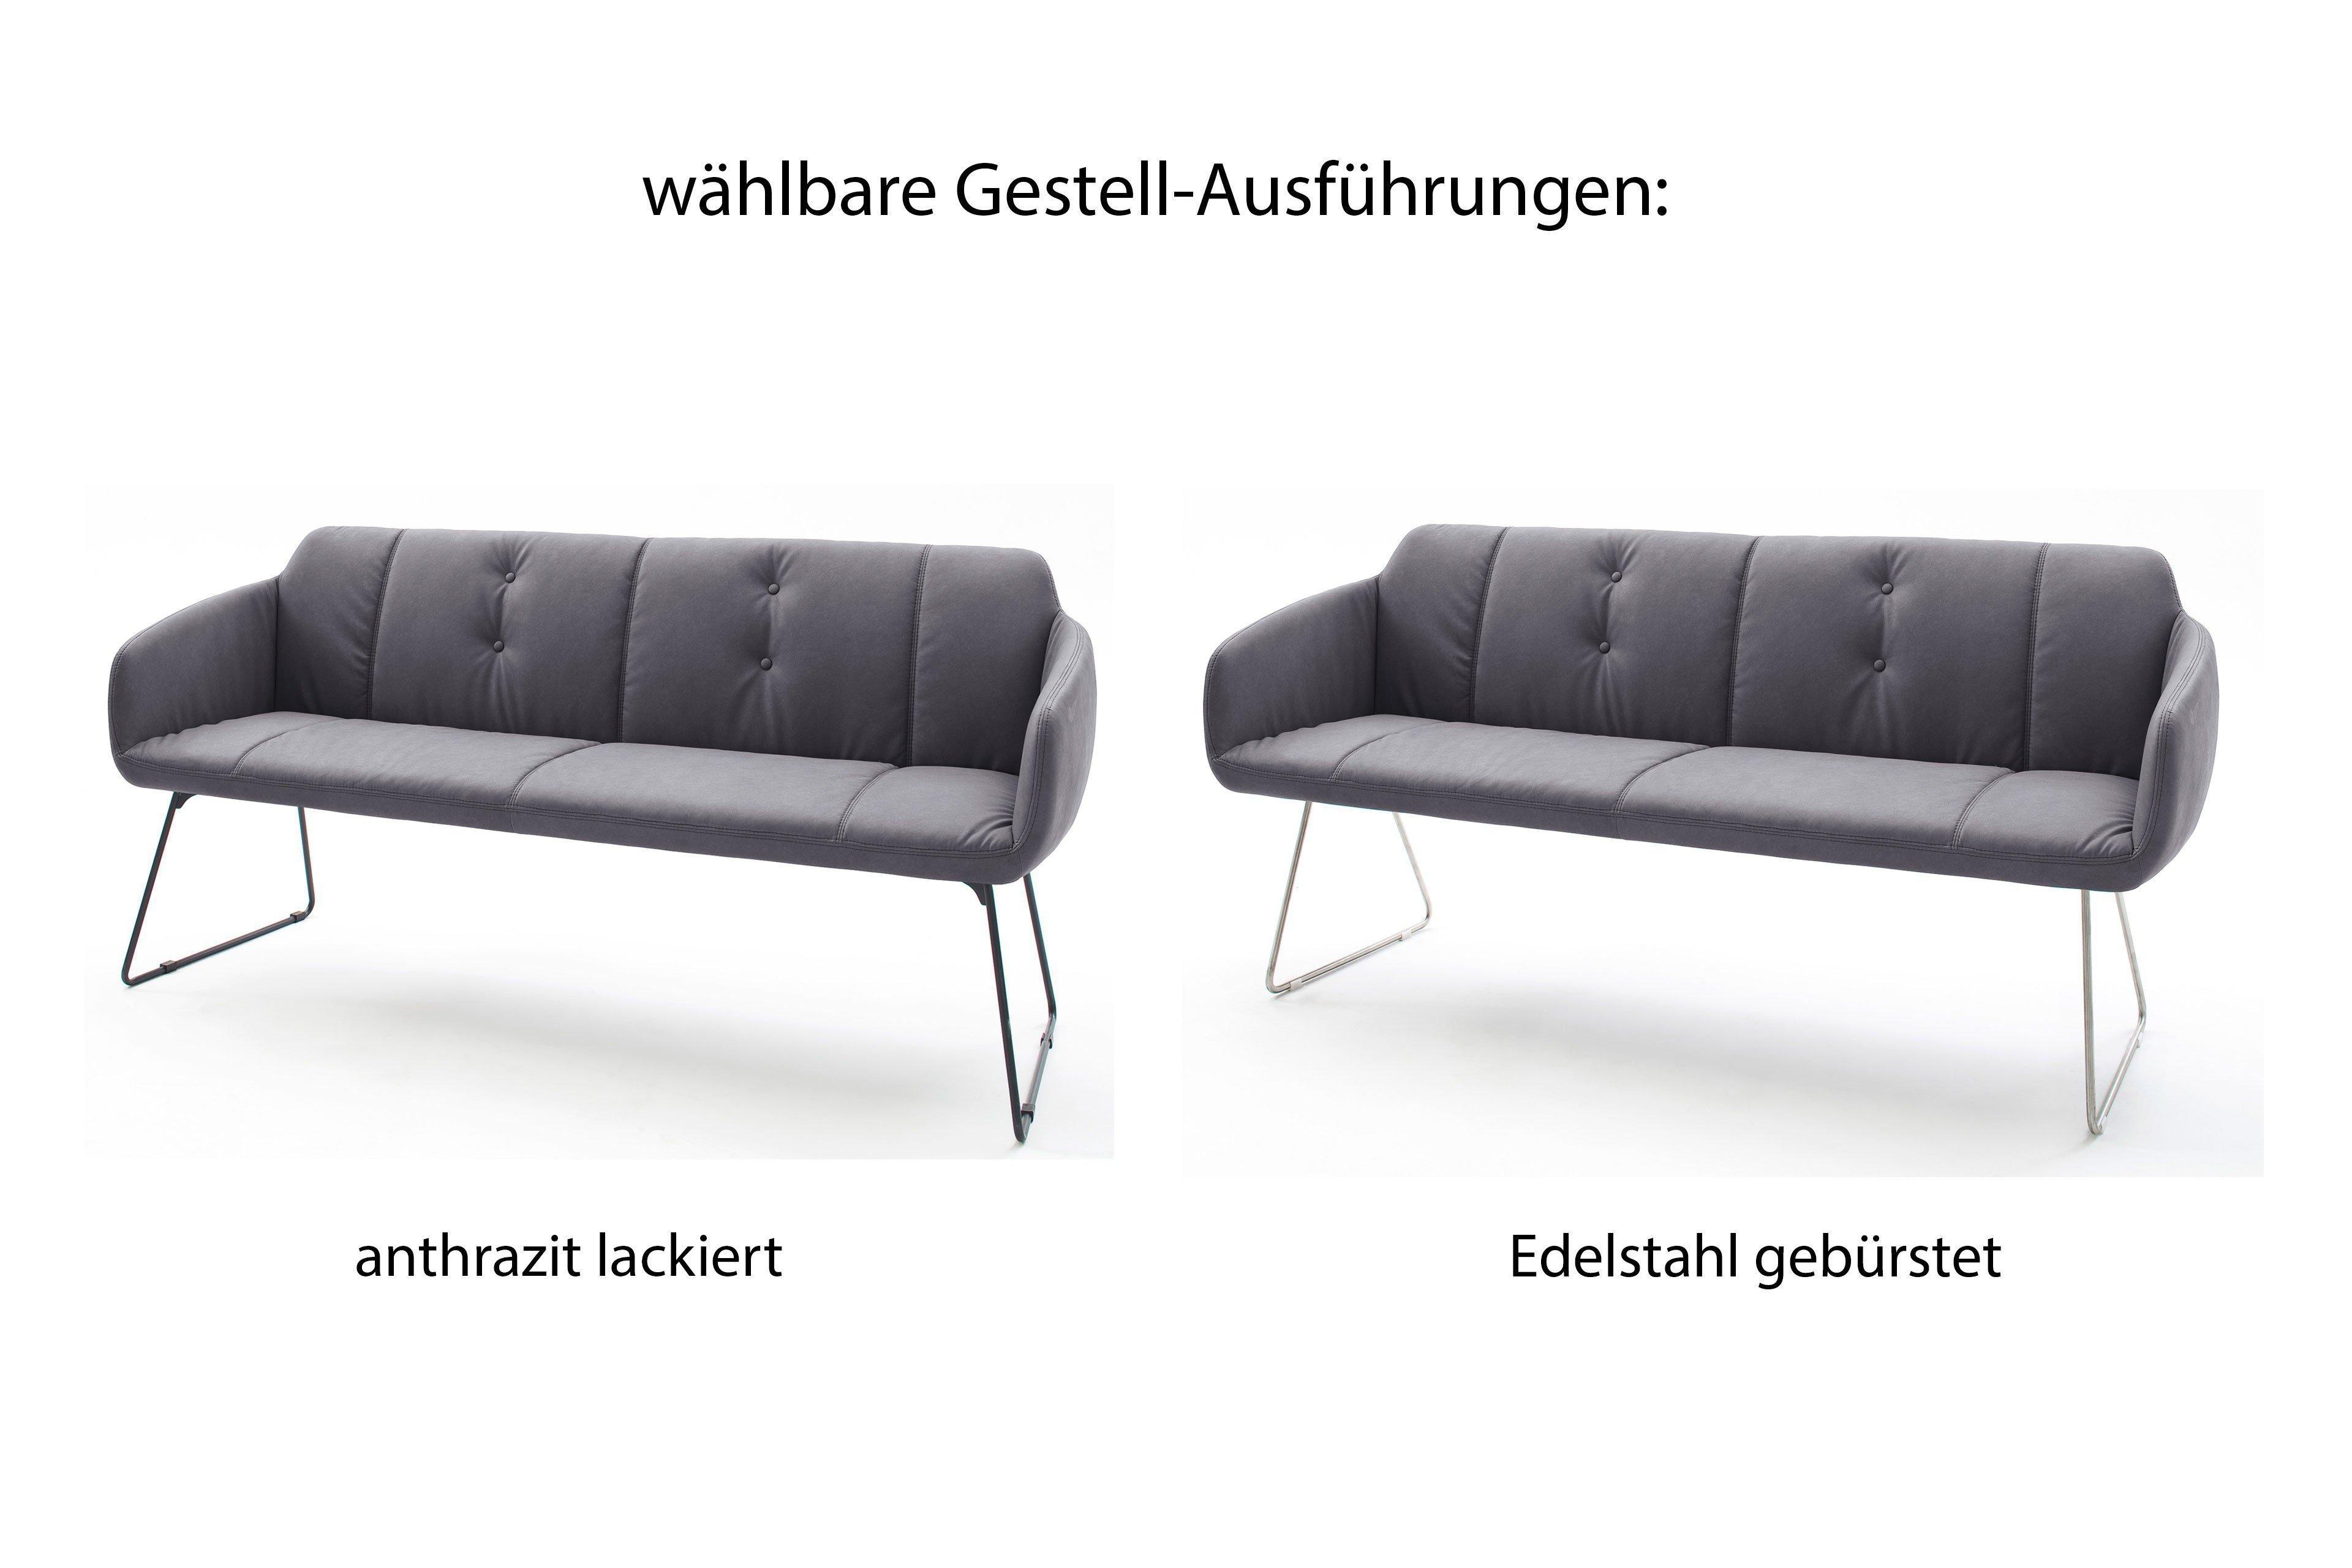 machalke bank beautiful brhl alba lounge garnitur uvp uac. Black Bedroom Furniture Sets. Home Design Ideas